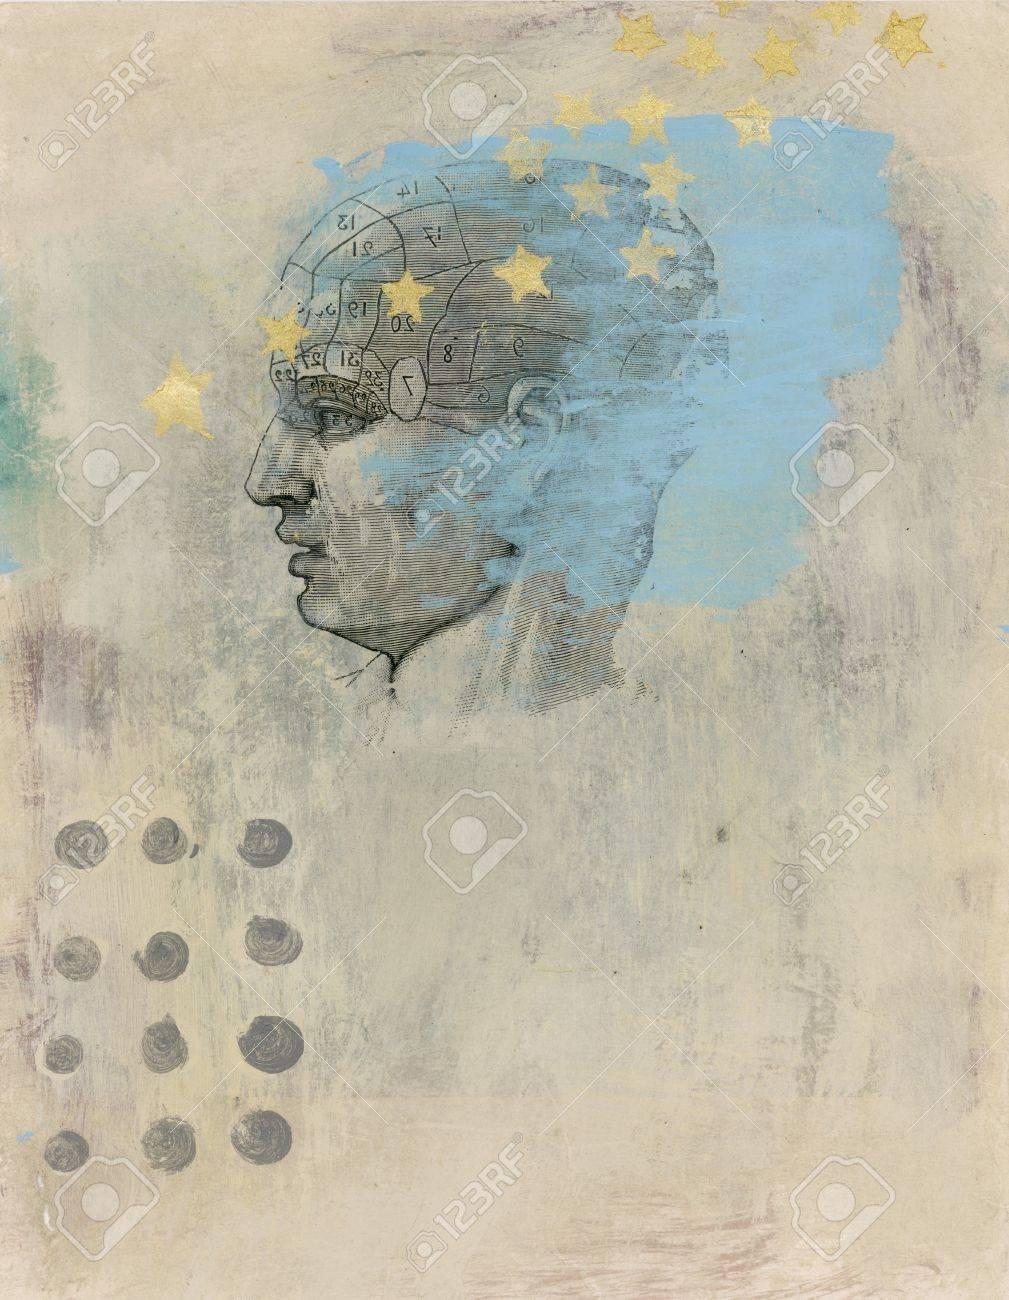 Phrenology head with stars. Acrylic and Gel medium transfer on paper mixed medium art. - 8216491